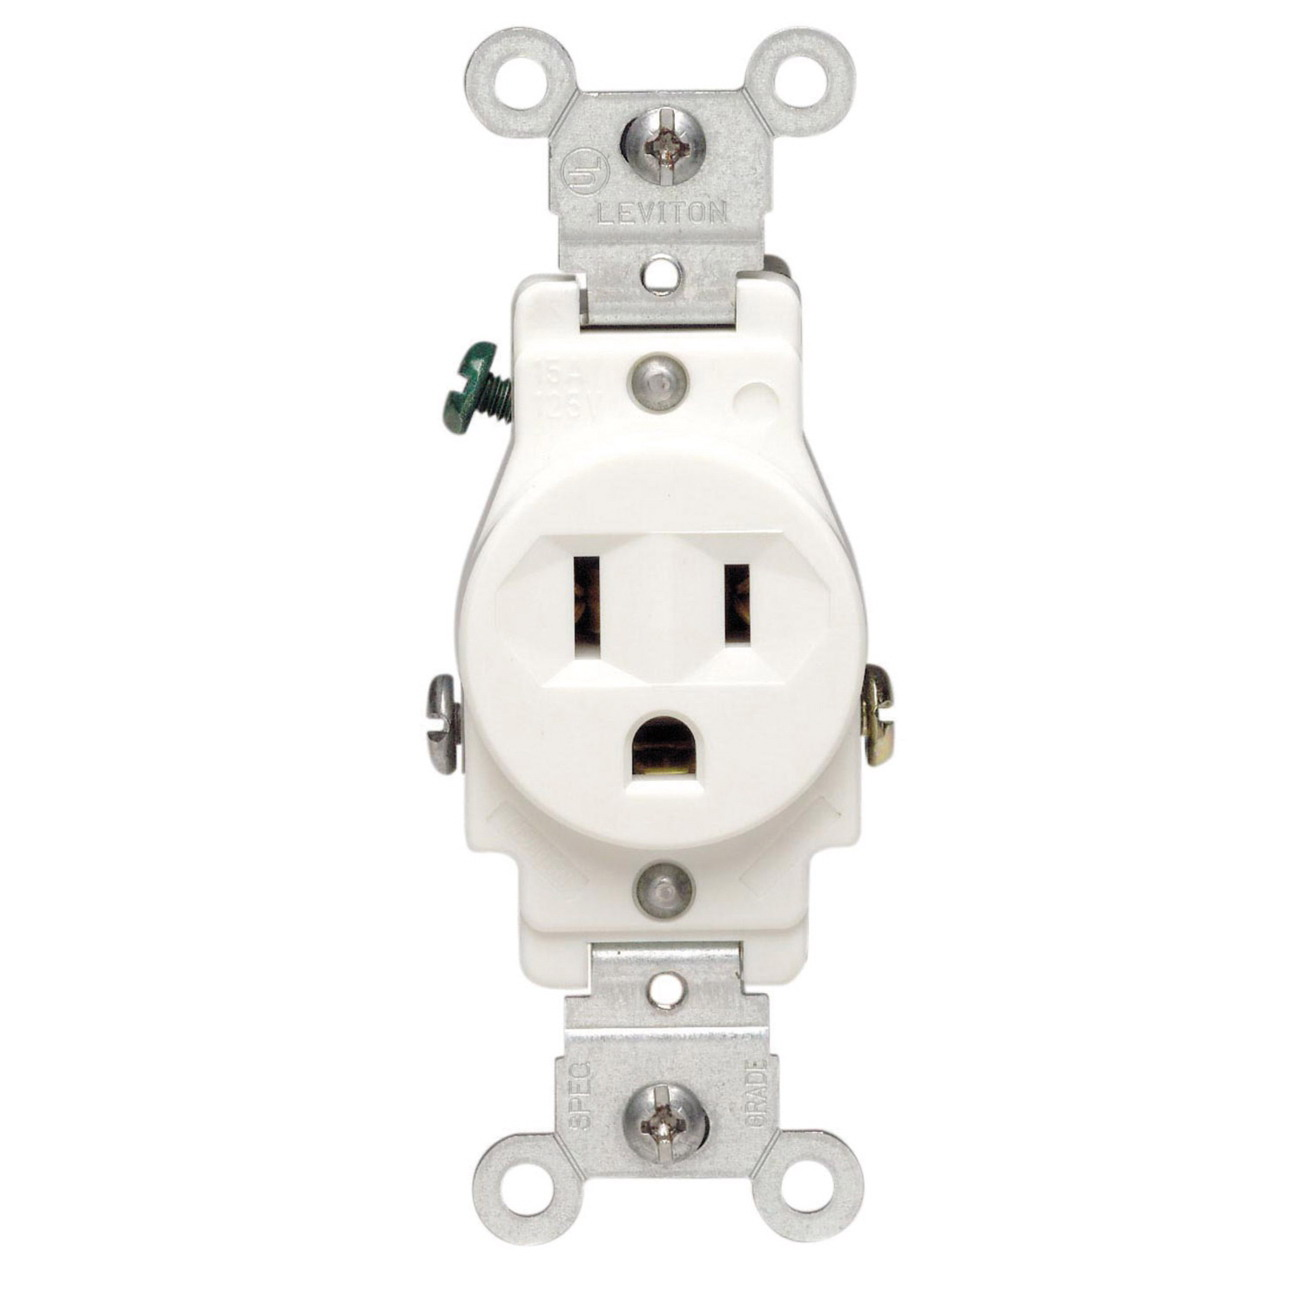 Leviton S02-05015-KWS Single Receptacle, 125 VAC, 15 A, 2 Pole, 3 Wire, White